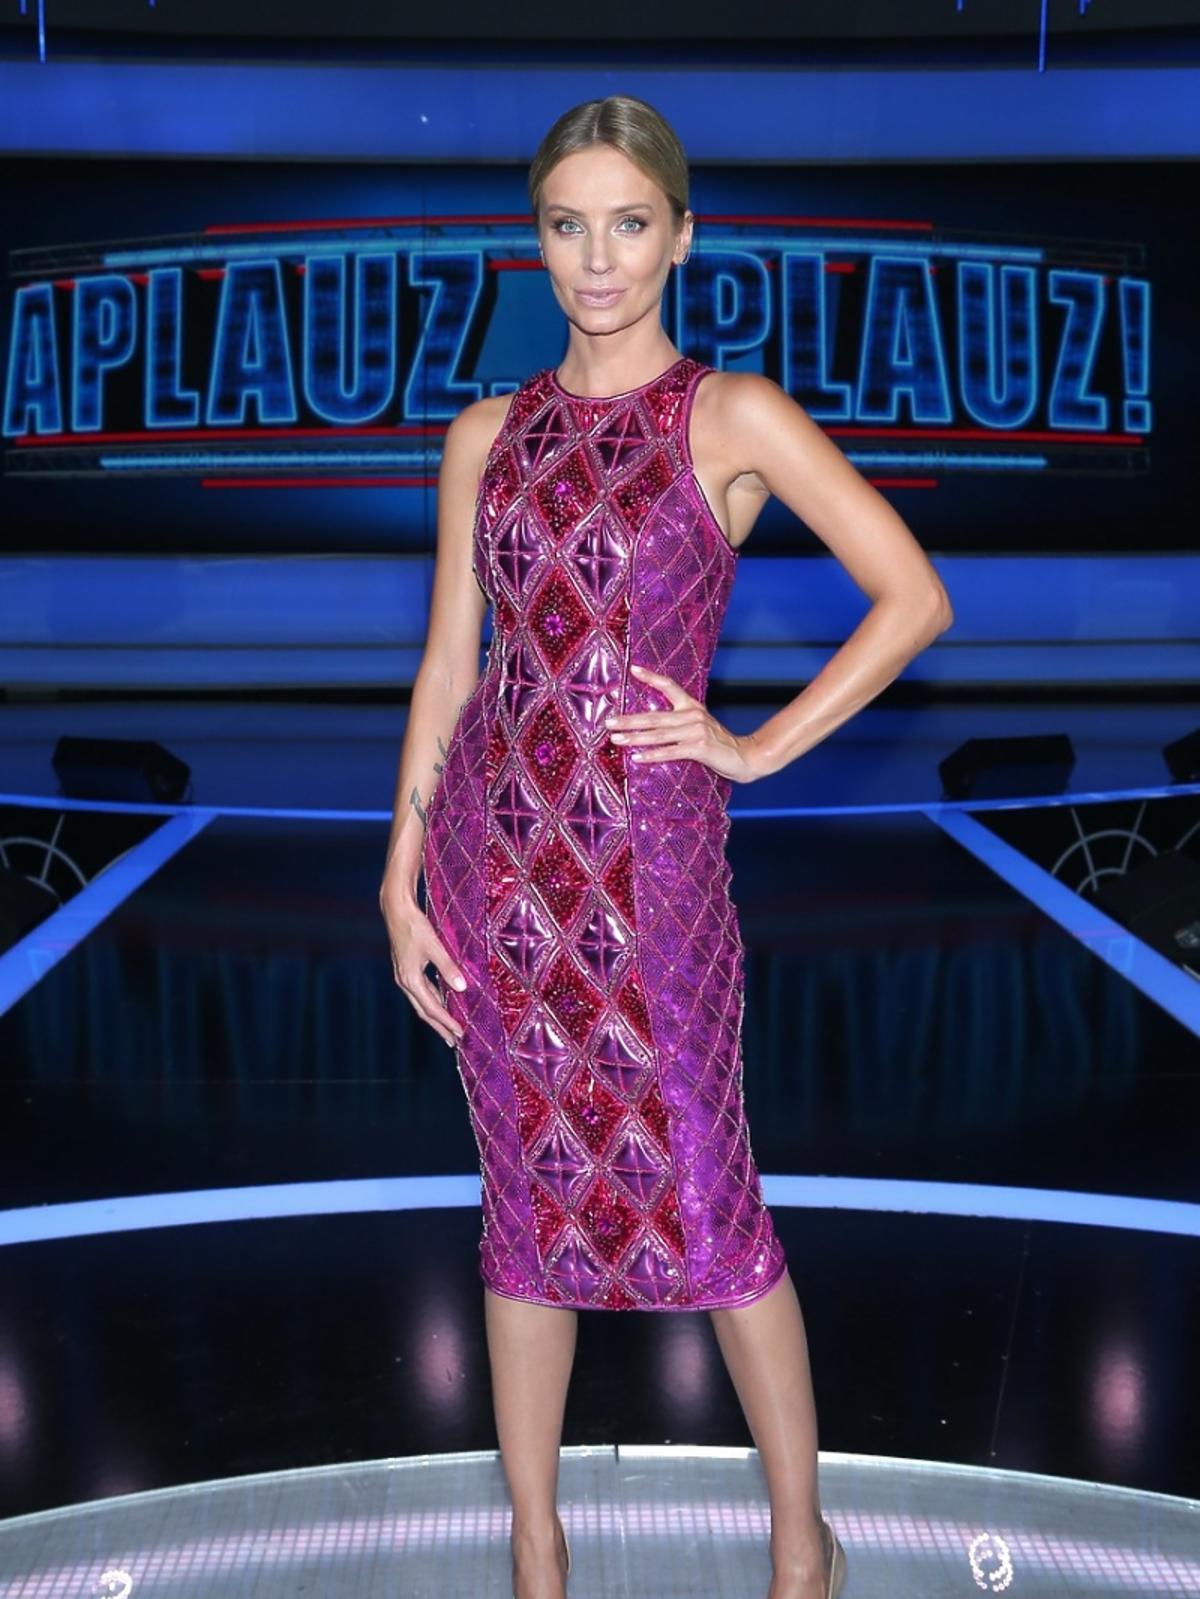 Agnieszka Szulim na nagraniu Apluaz Apluaz